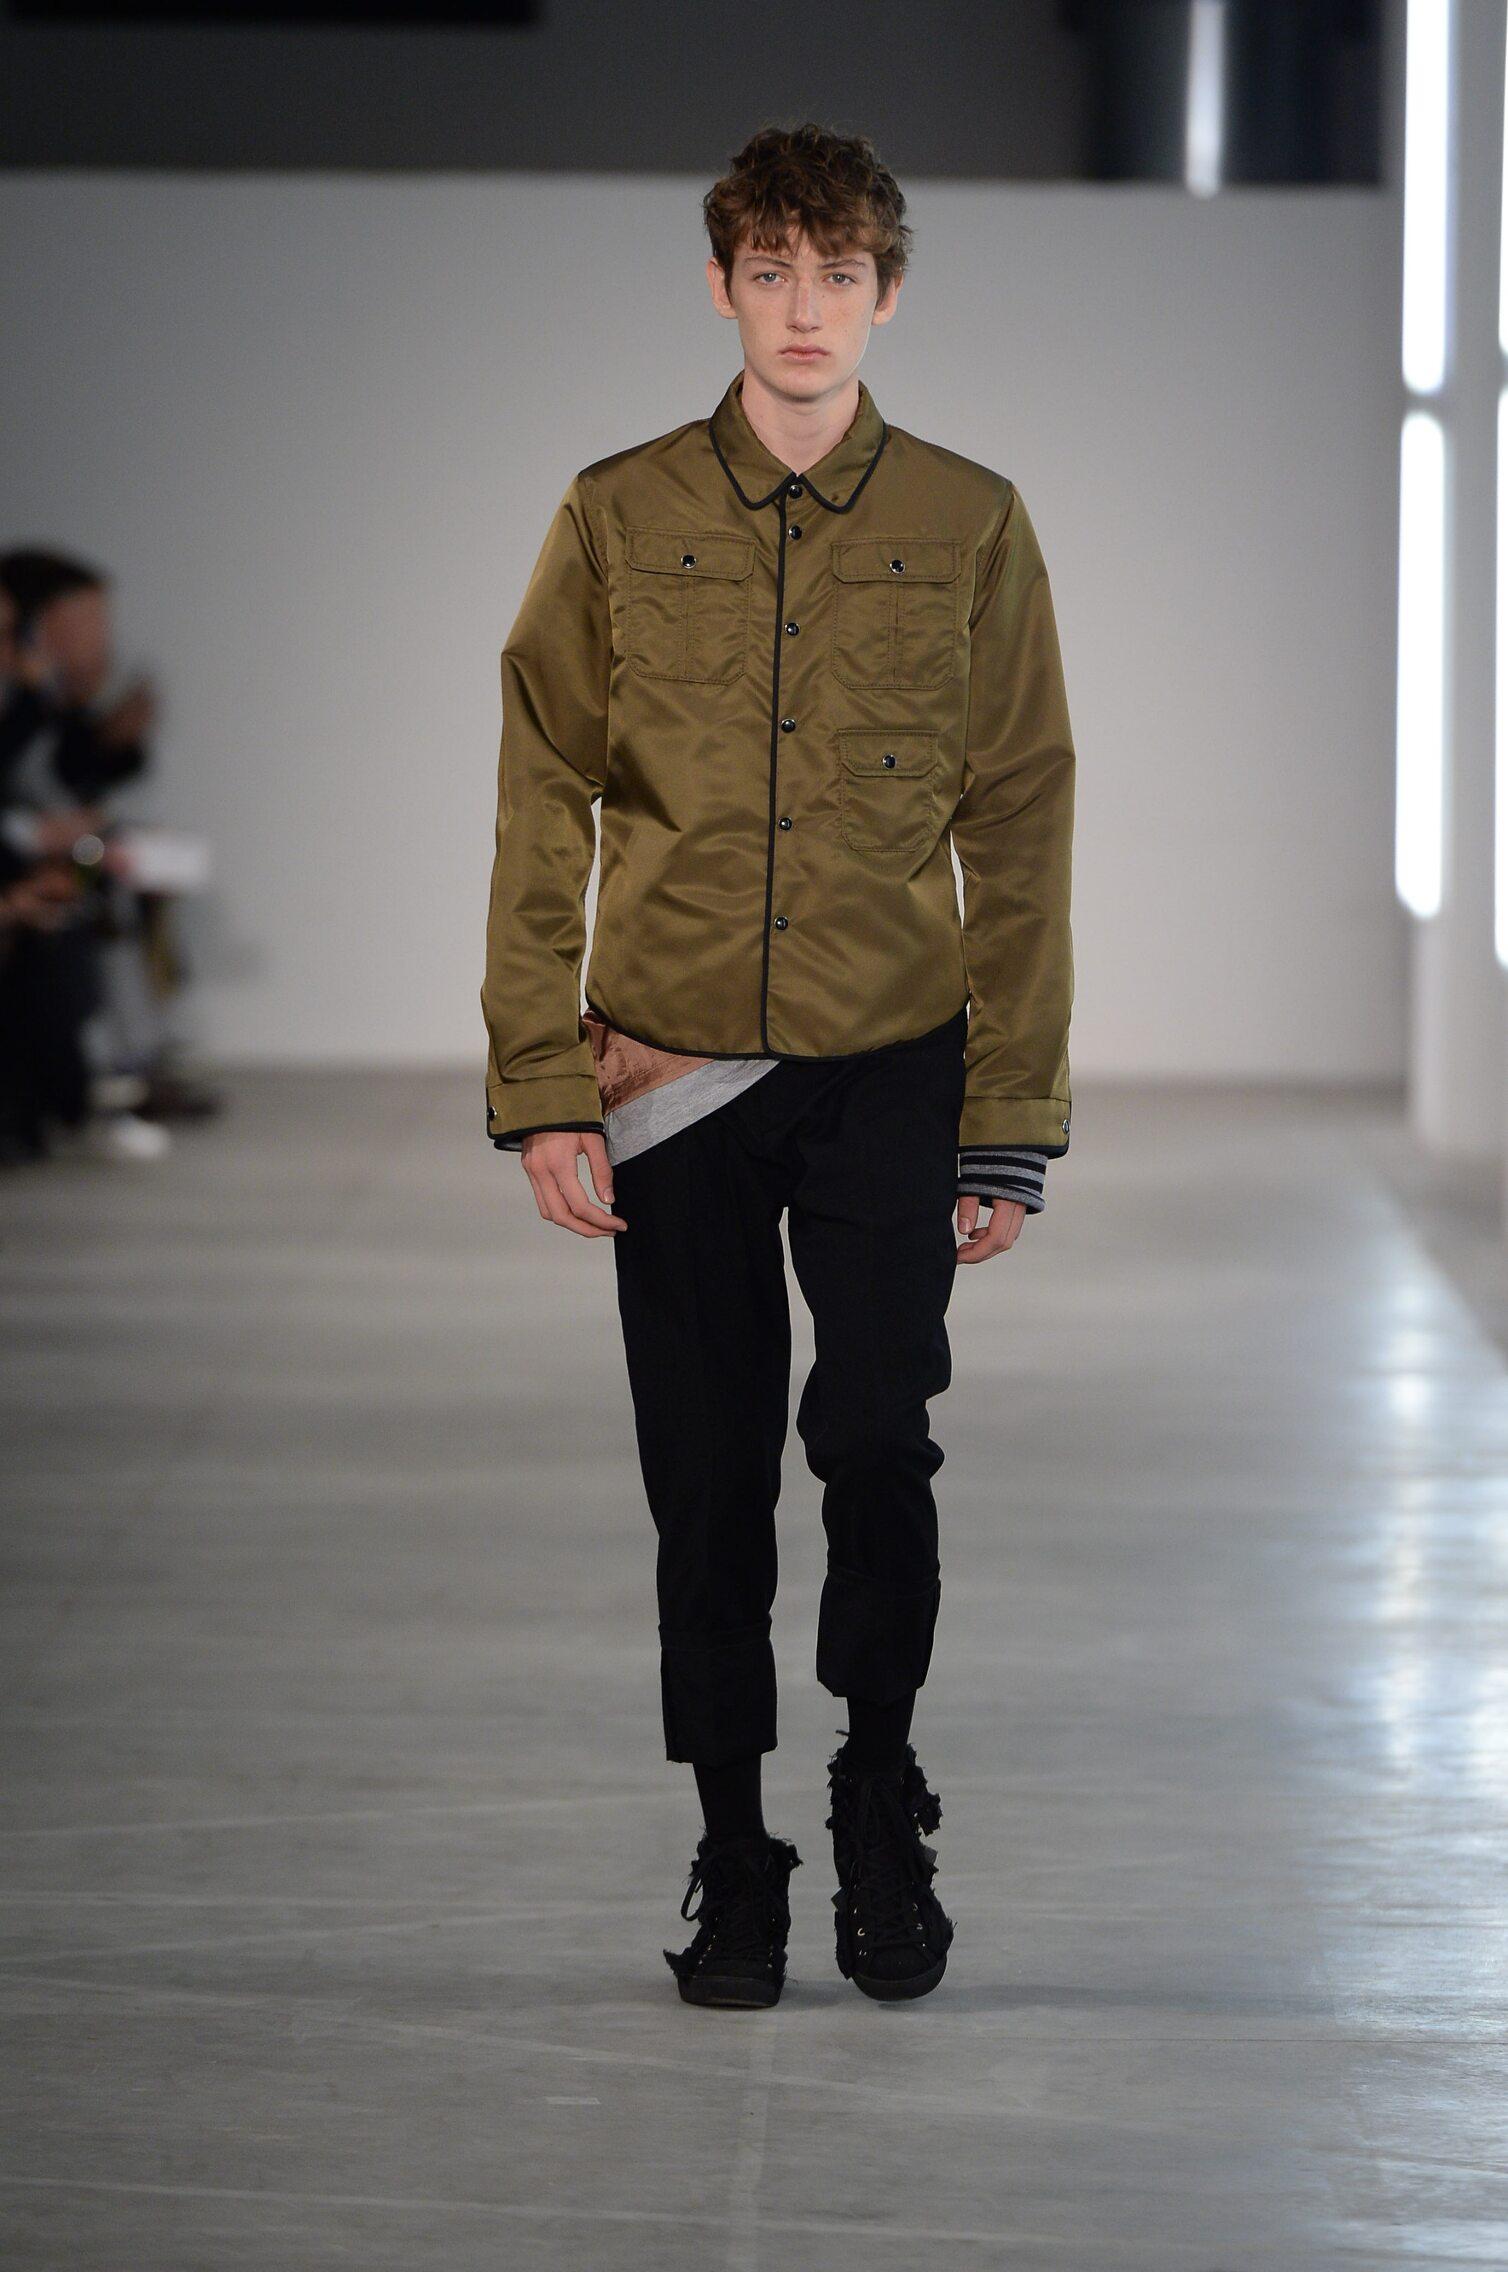 Fall 2016 17 Man Fashion Show N°21